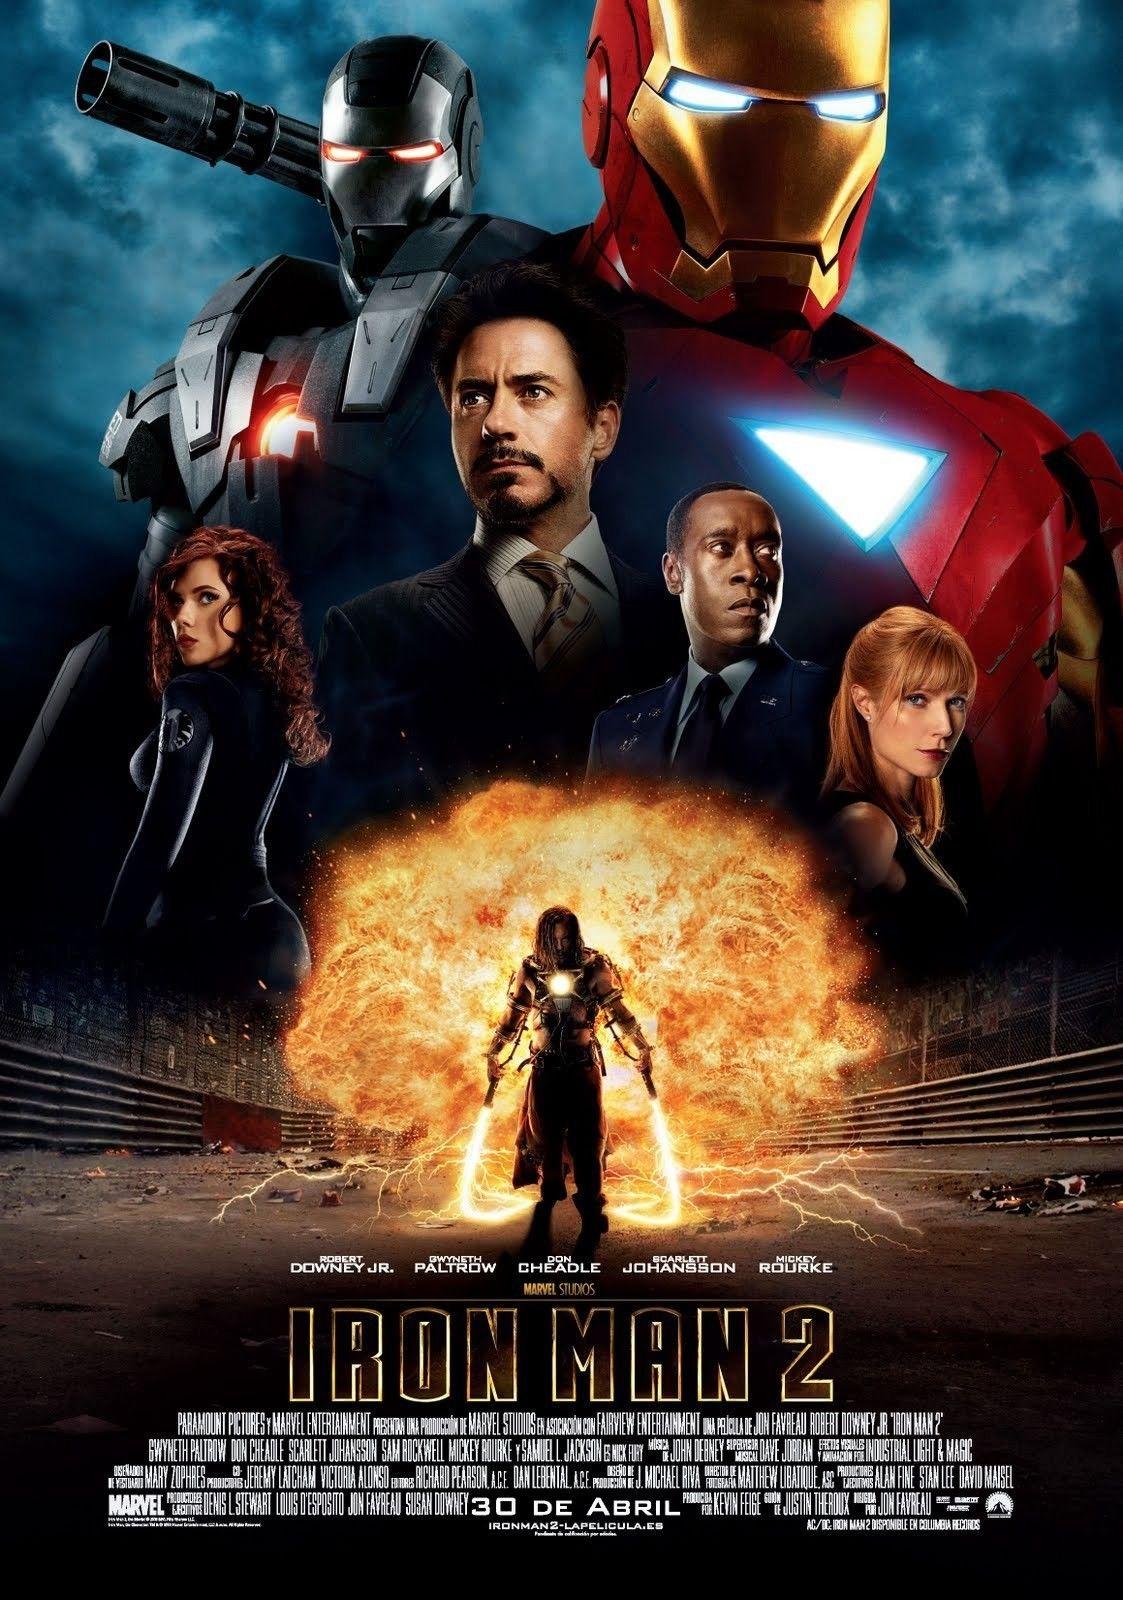 Ver Iron Man 2 Online Gratis 2010 Hd Pelicula Completa Espanol Marvel Movie Posters Iron Man Movie Iron Man Poster